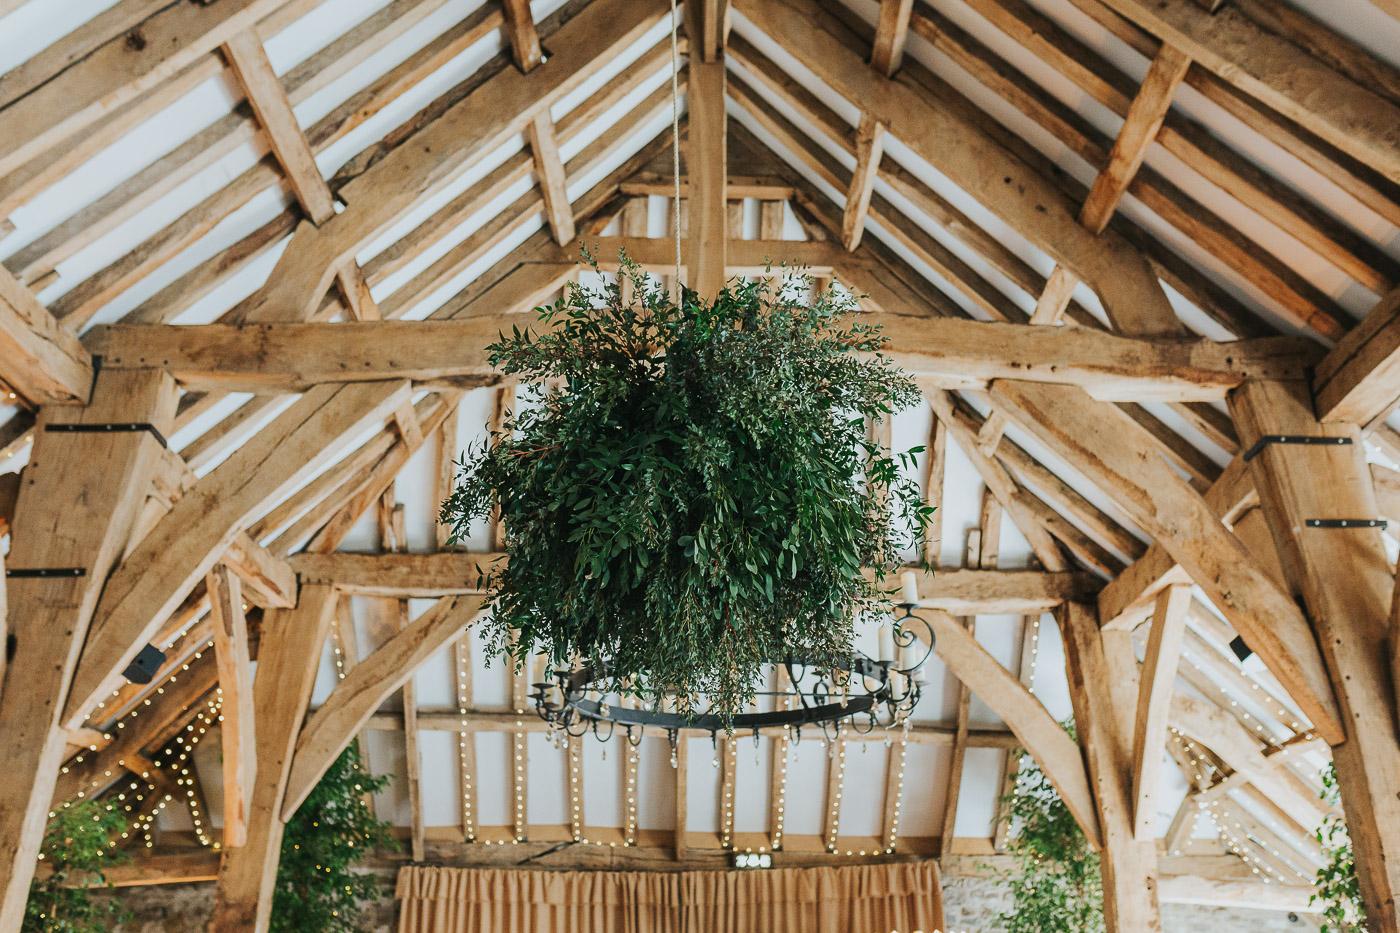 Tithe Barn - Laura Calderwood Photography - 29.3.19 - Mr & Mrs Lancaster290319-46.jpg